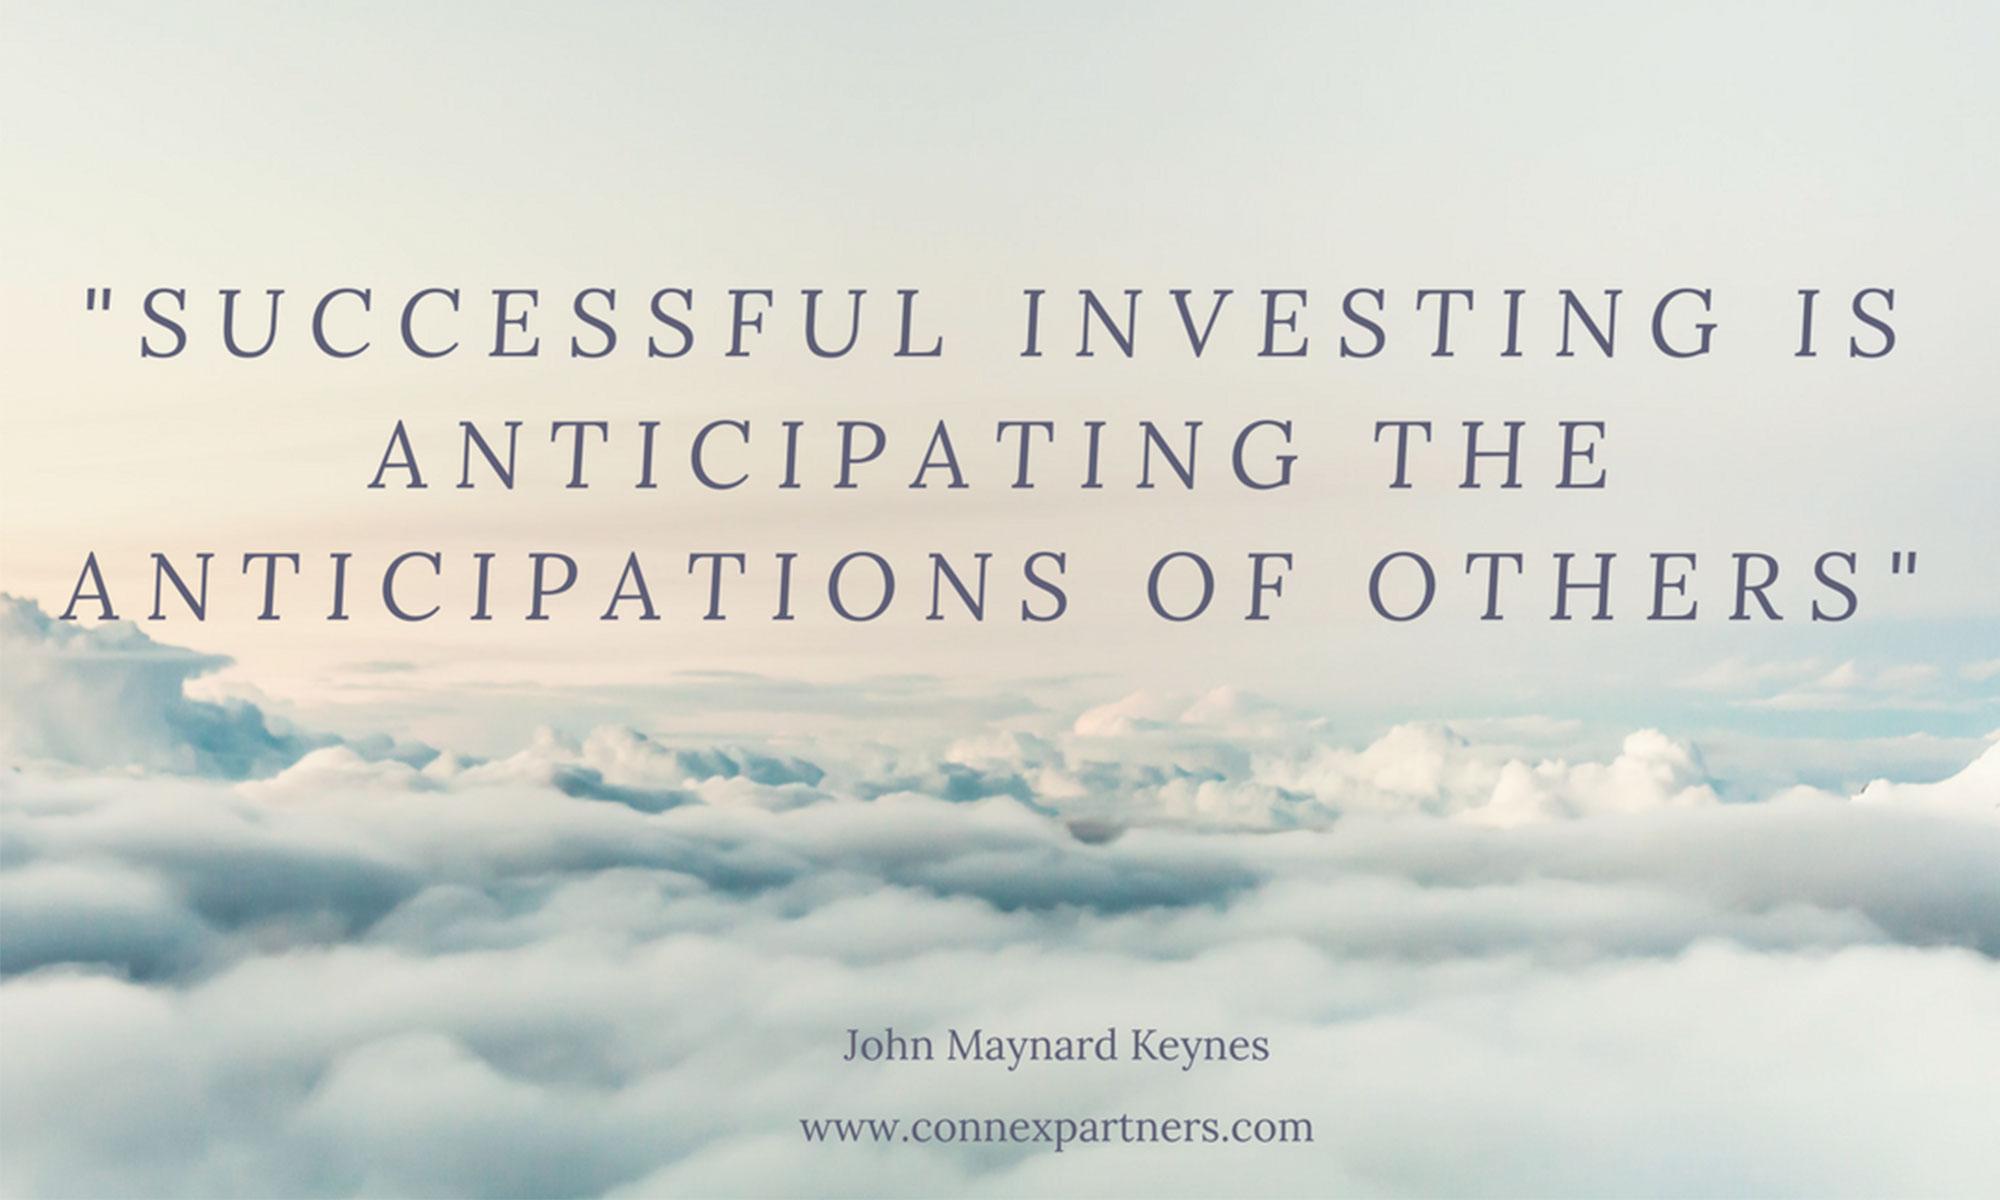 John Maynard Keynes on Investing